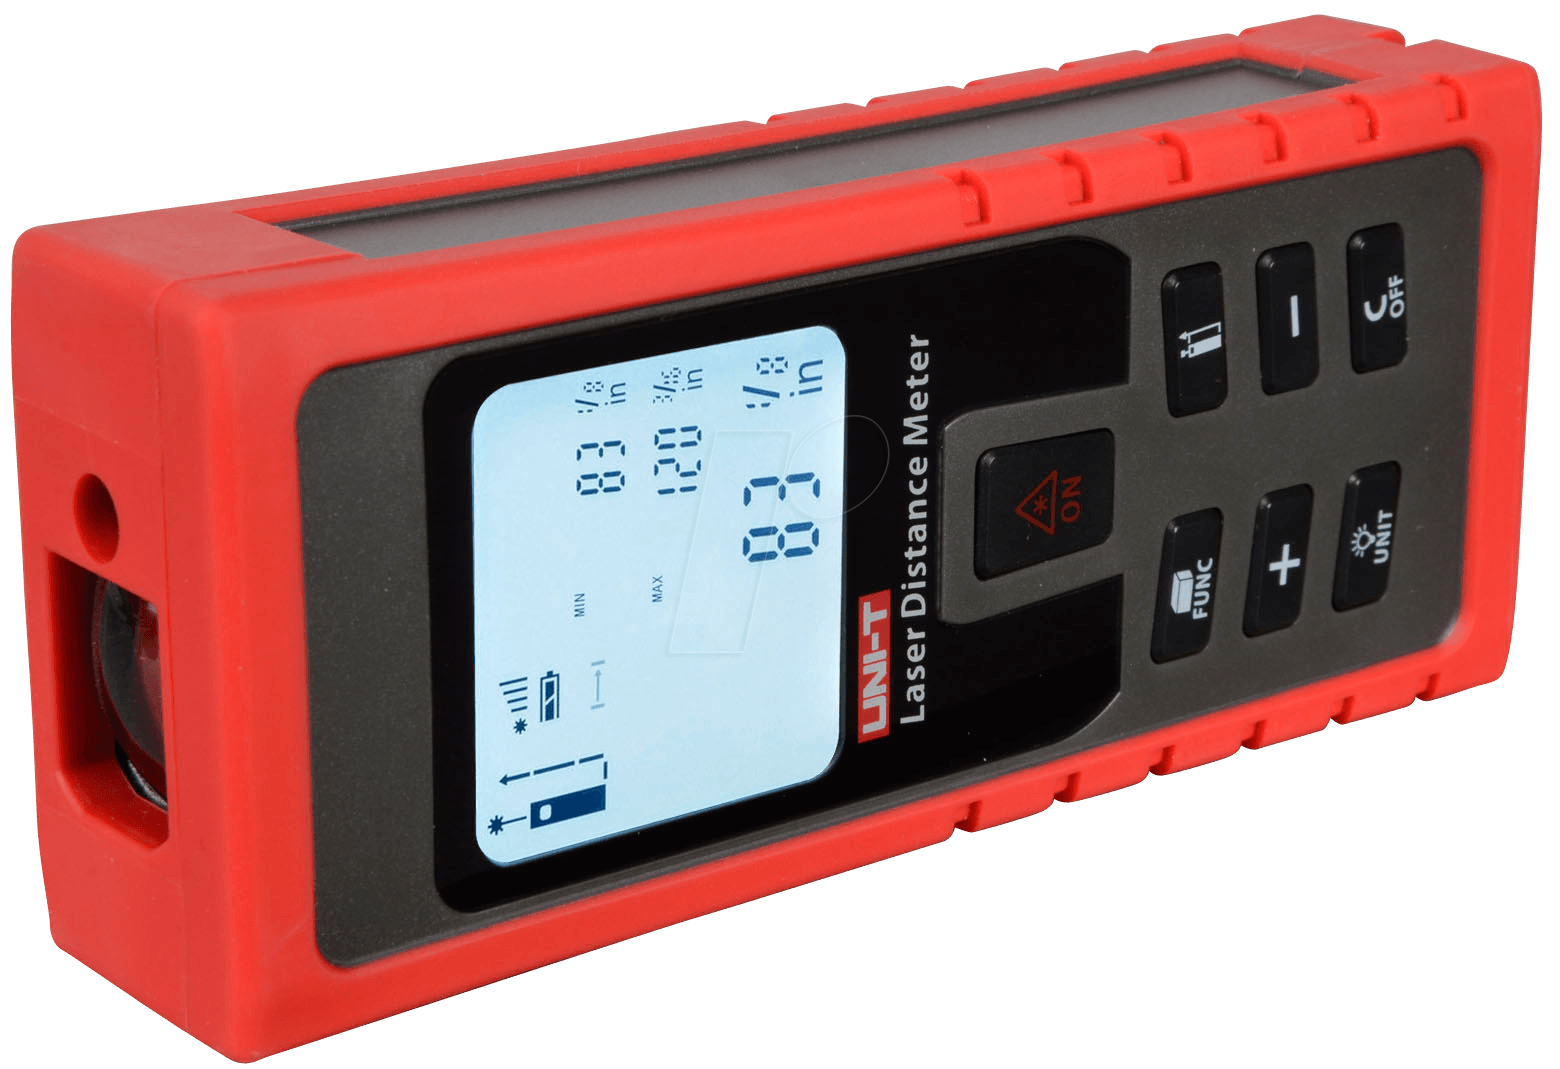 Digitaler Entfernungsmesser Aldi : Aldi laser entfernungsmesser ultraschall ebay